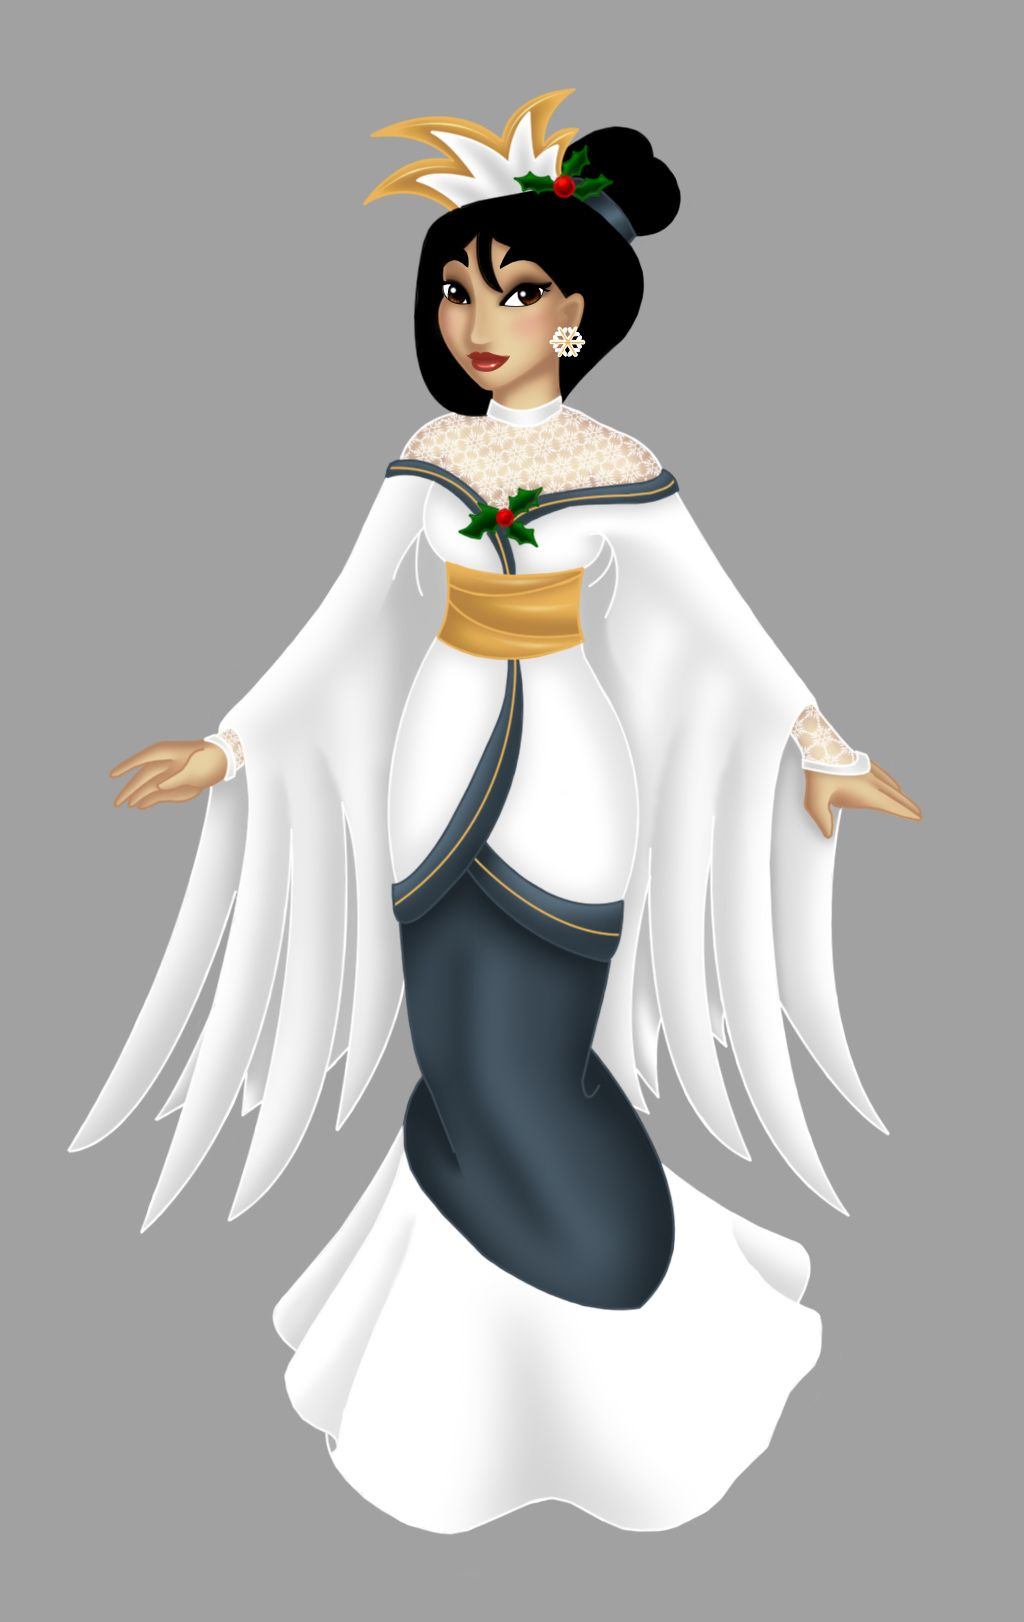 Christmas dress up - Mulan Dress Up Deviantart Mulan Christmas Dress By Opal I